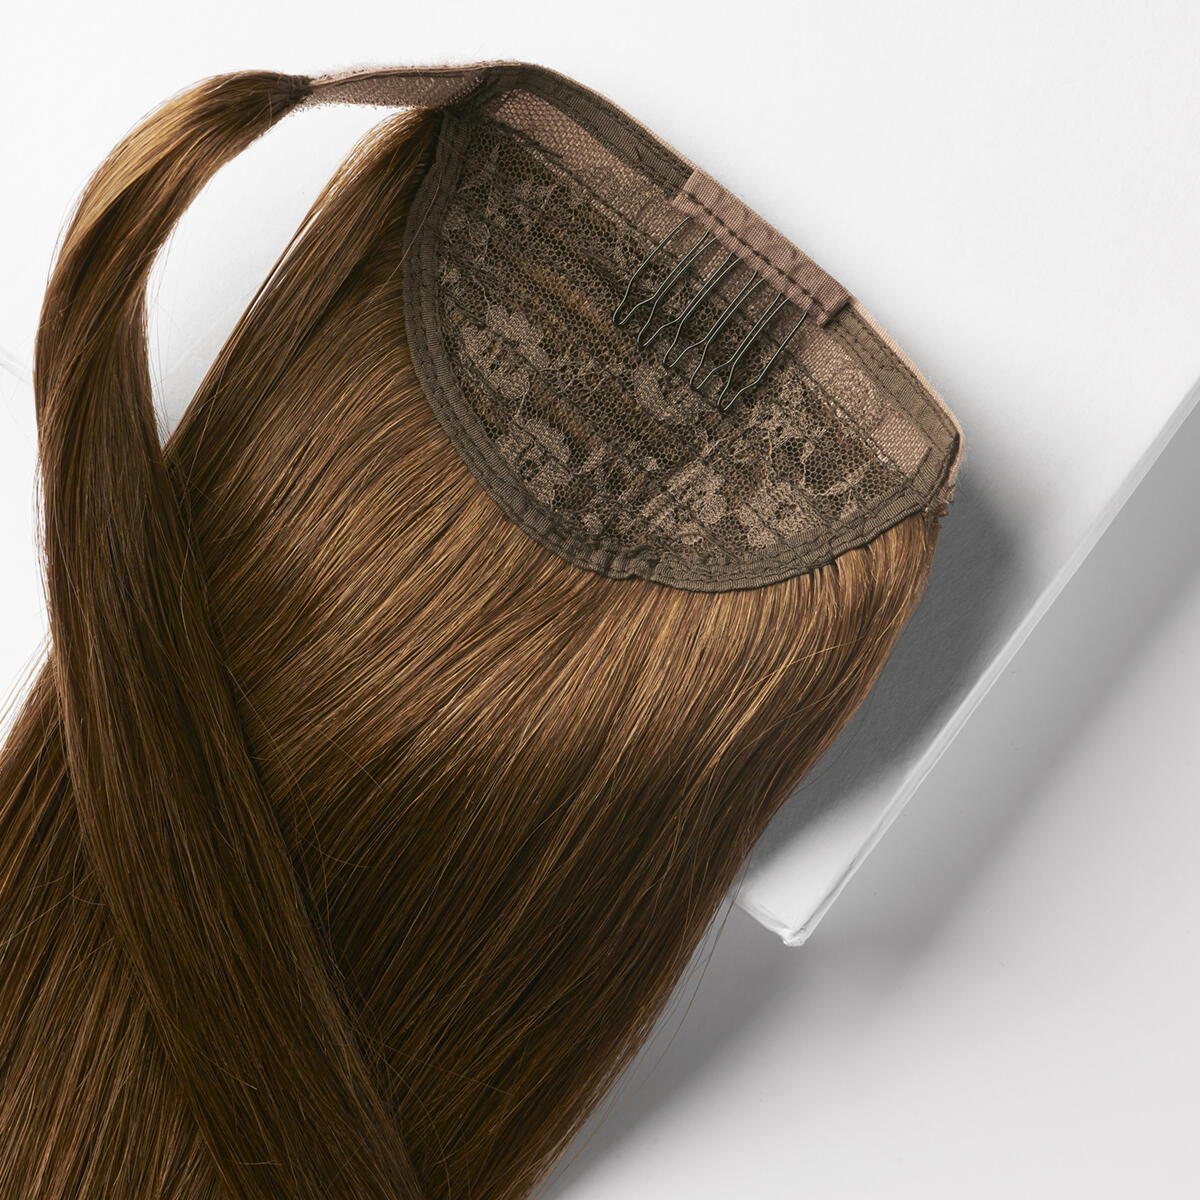 Clip-in Ponytail 5.0 Brown 40 cm